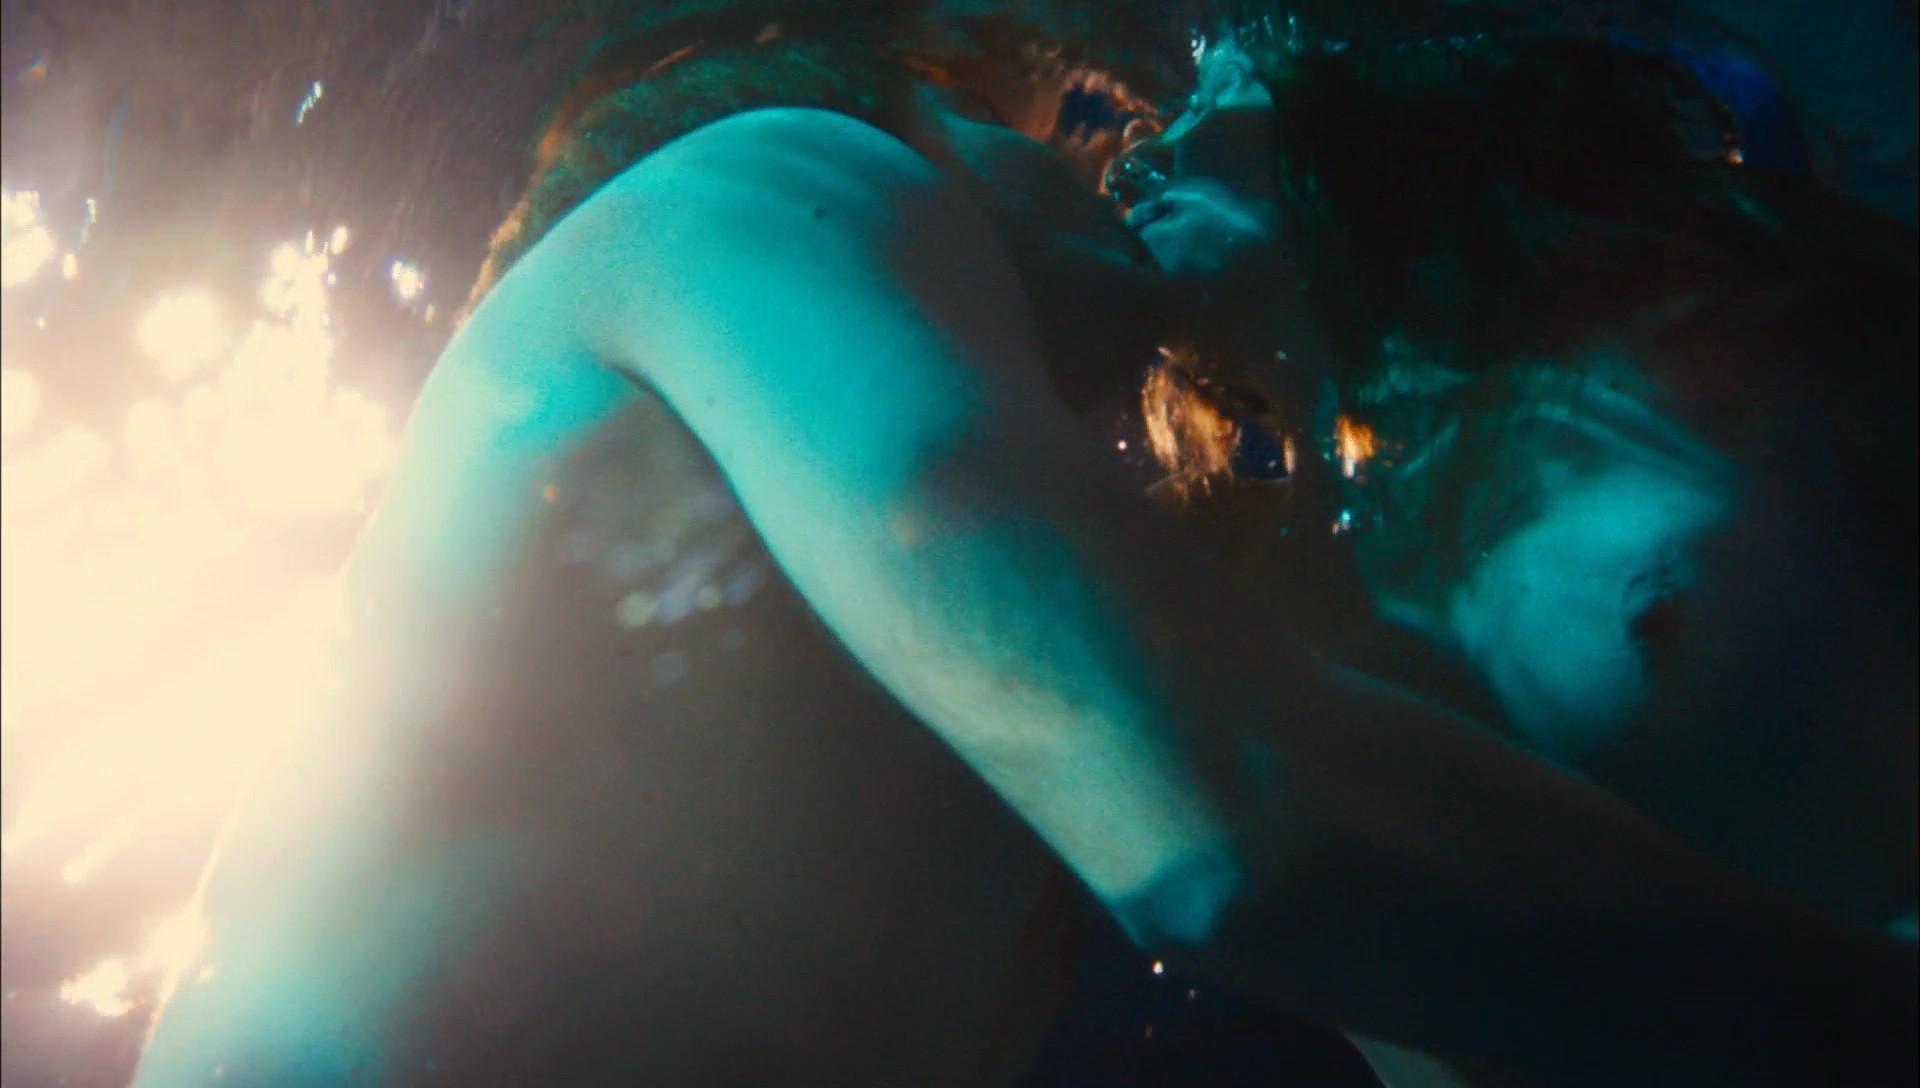 Natalie Dormer desnudándose